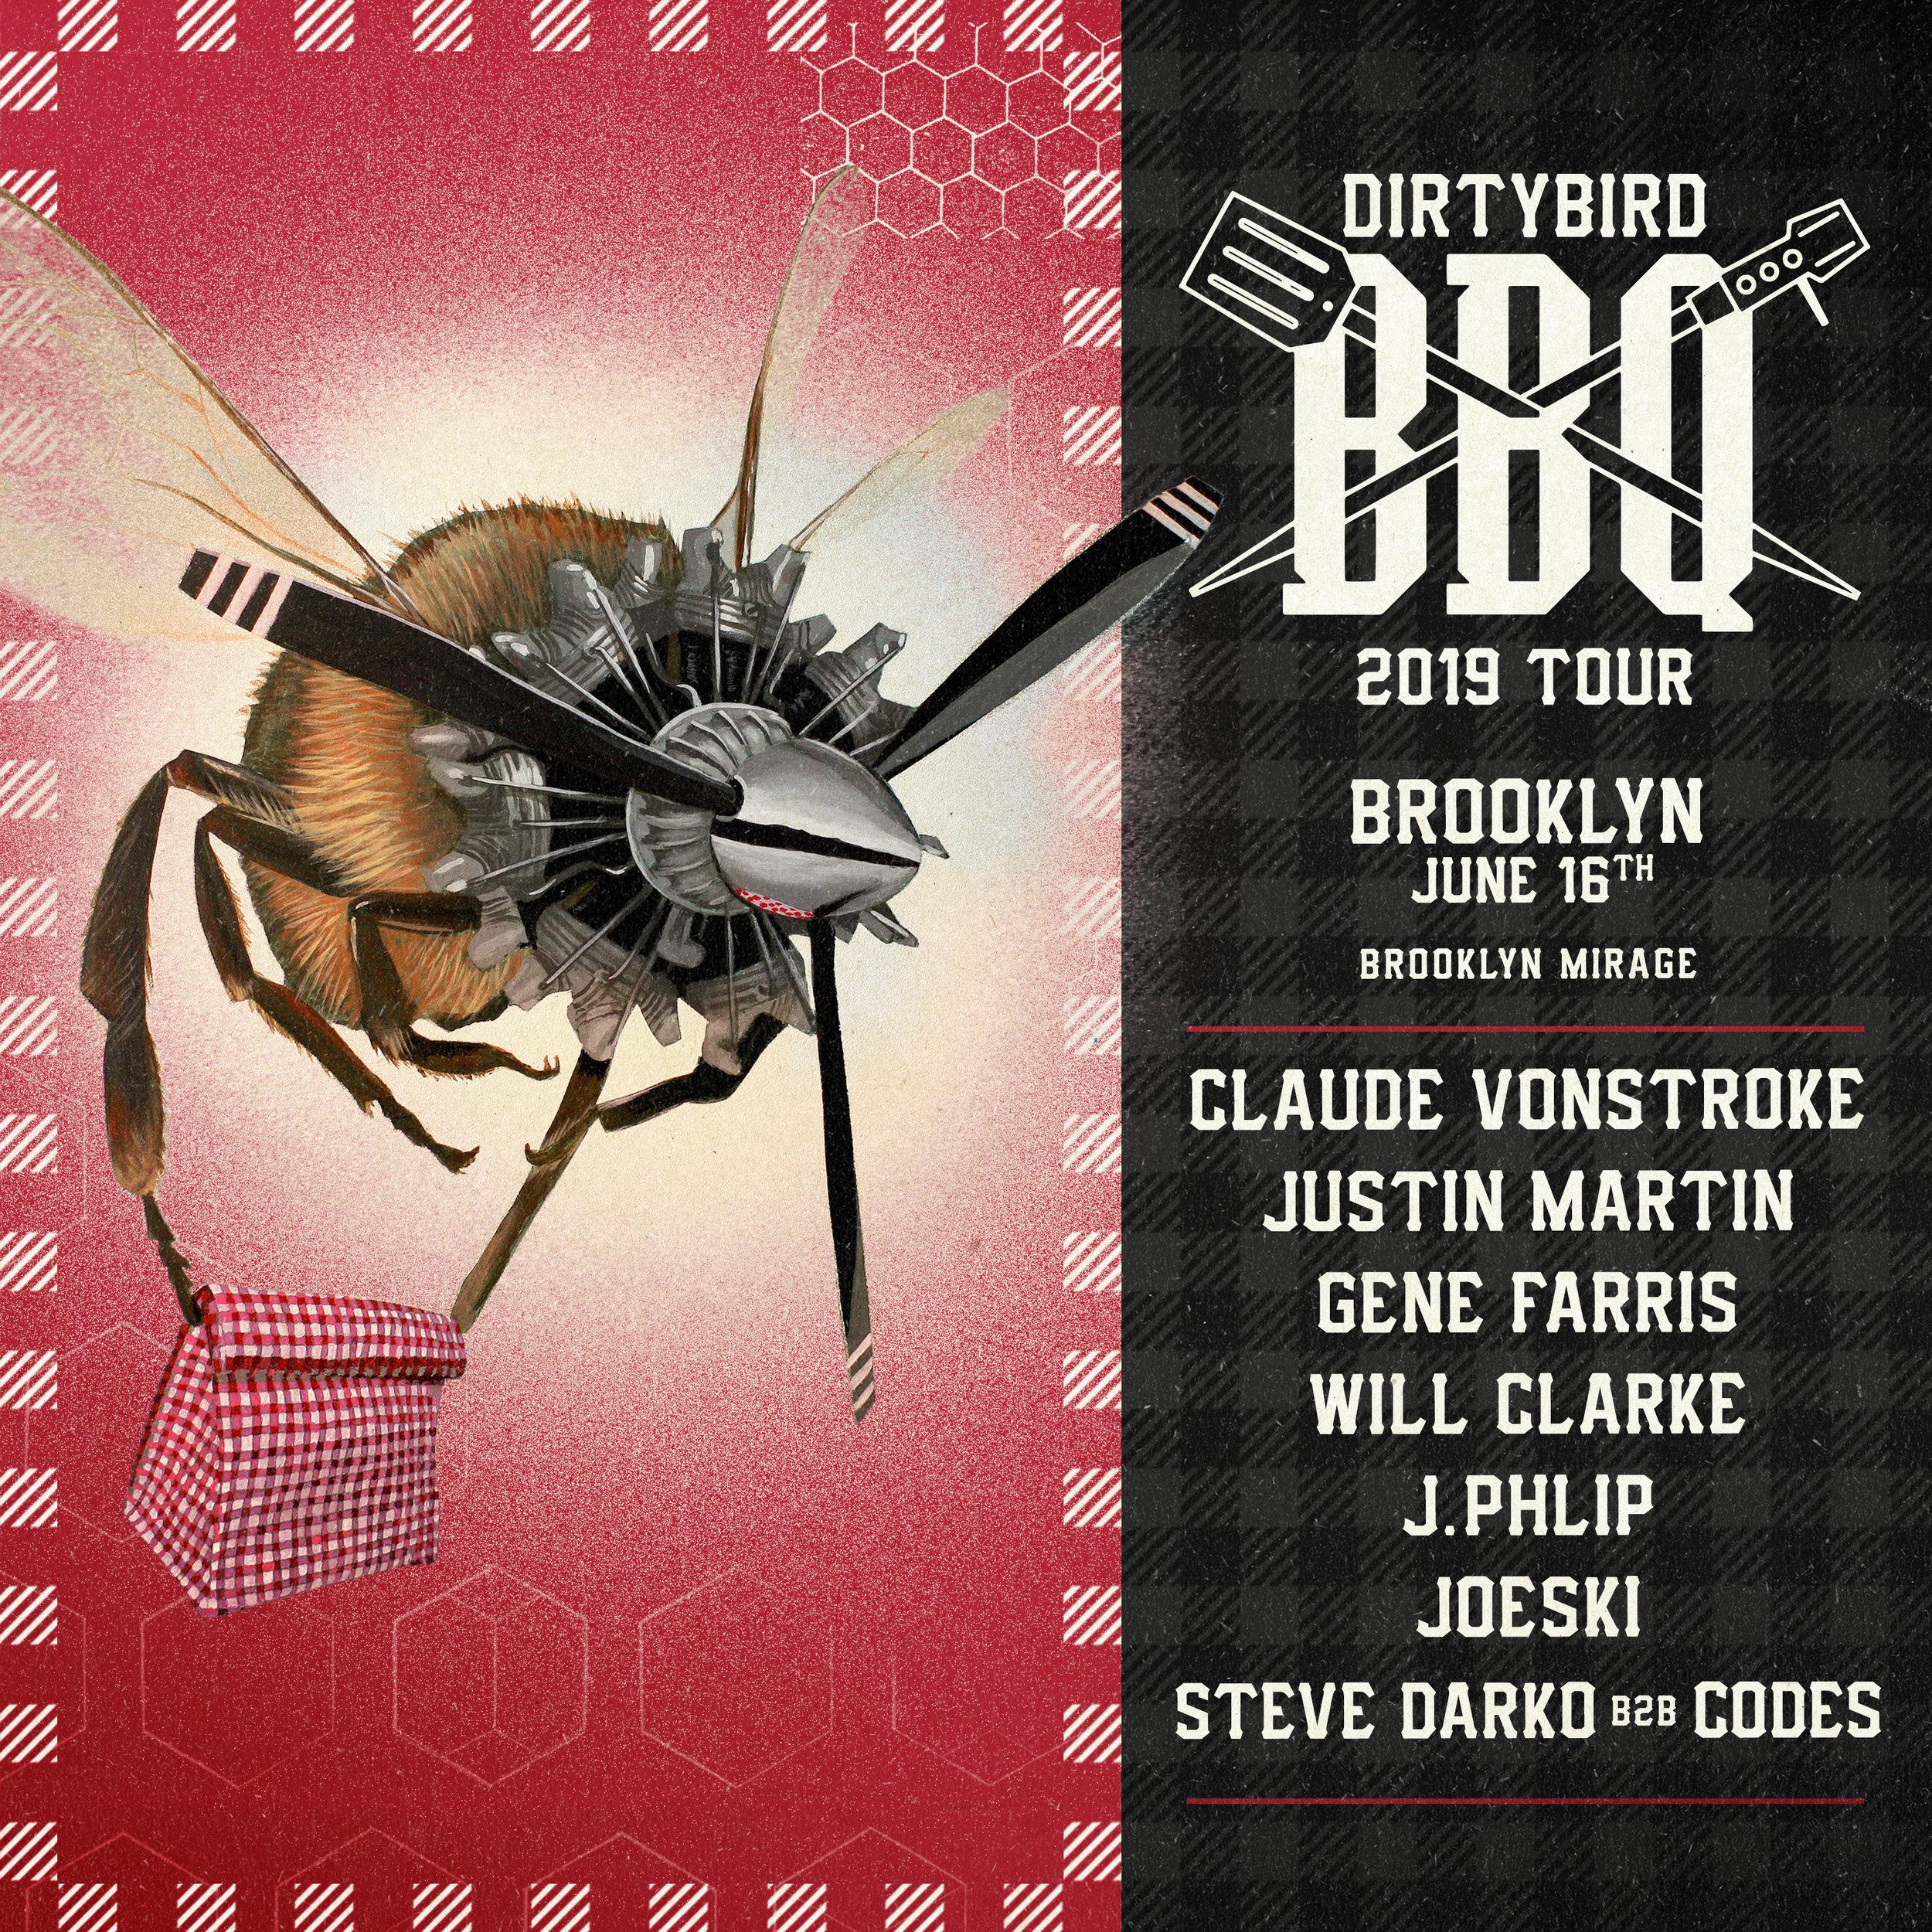 BK-BBQ-Tour-2019-Lineup---Instagram-Post---2400x2400---v1.jpg